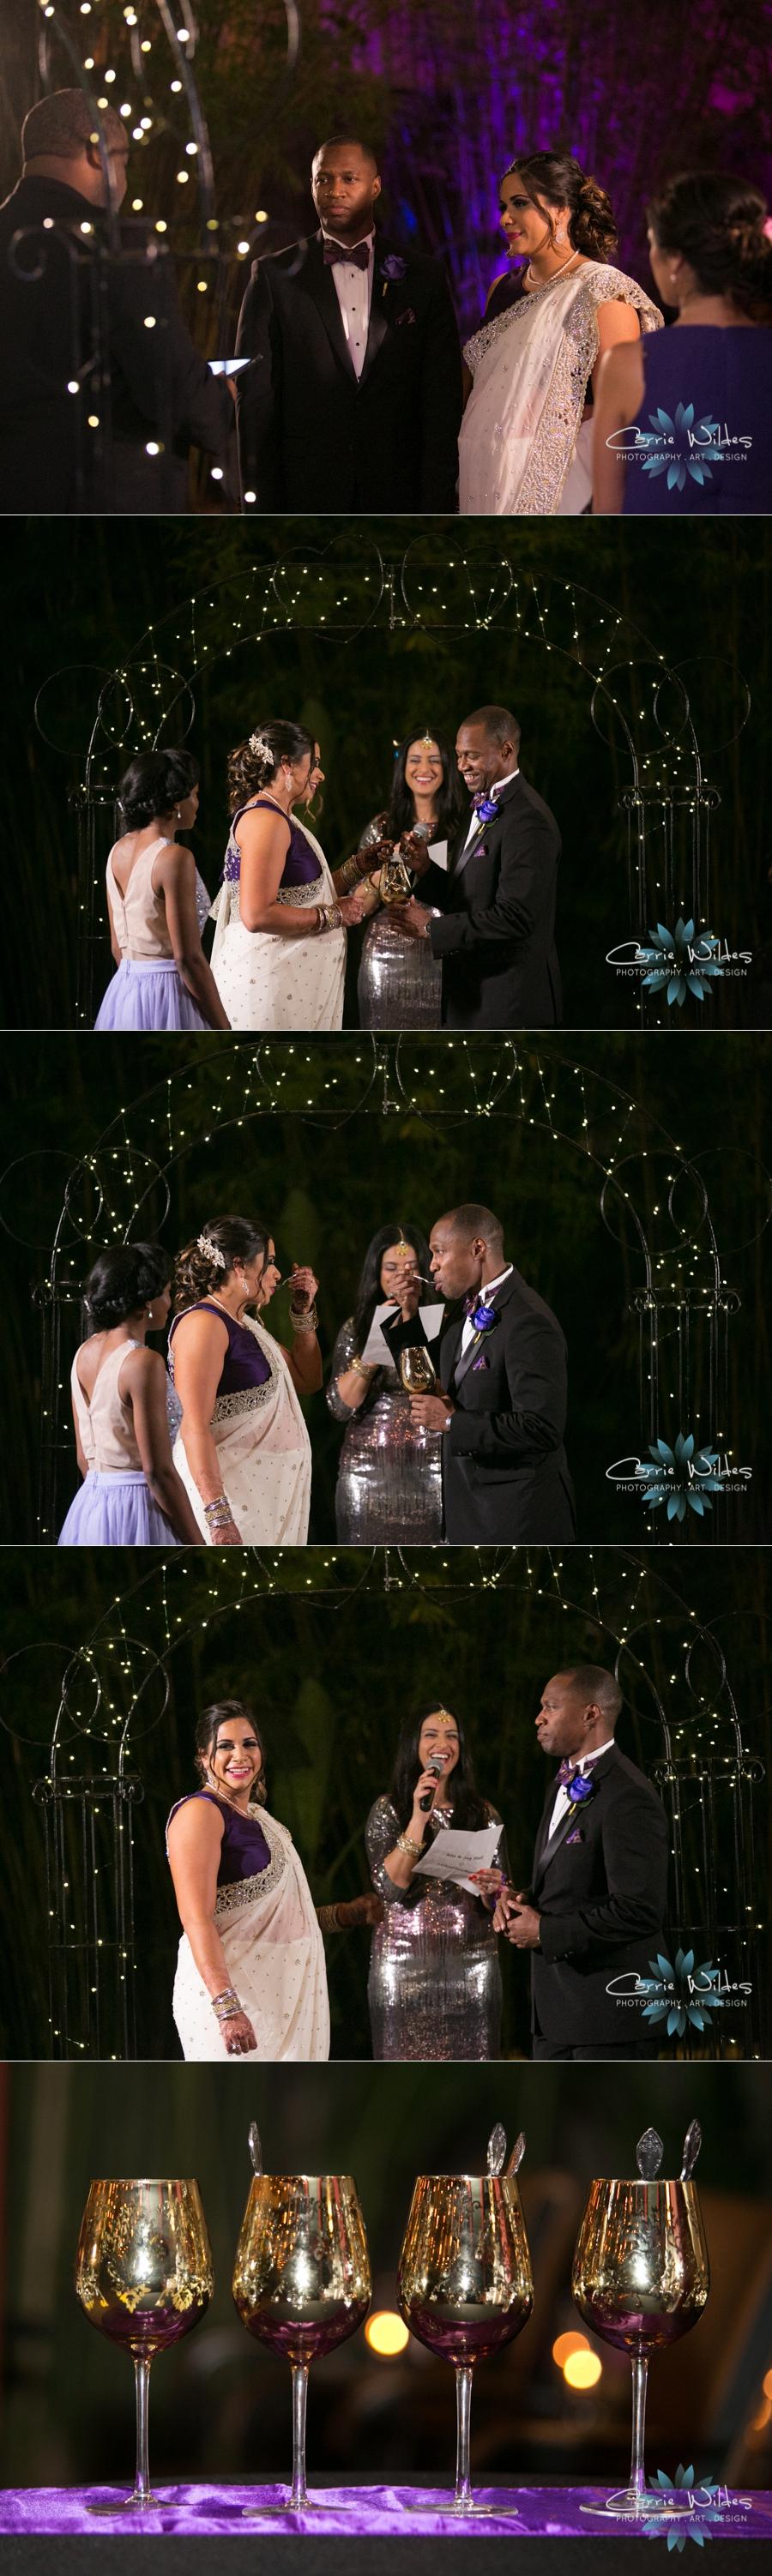 11_4_18 Alia and Jay Nova 535 Wedding_0023.jpg